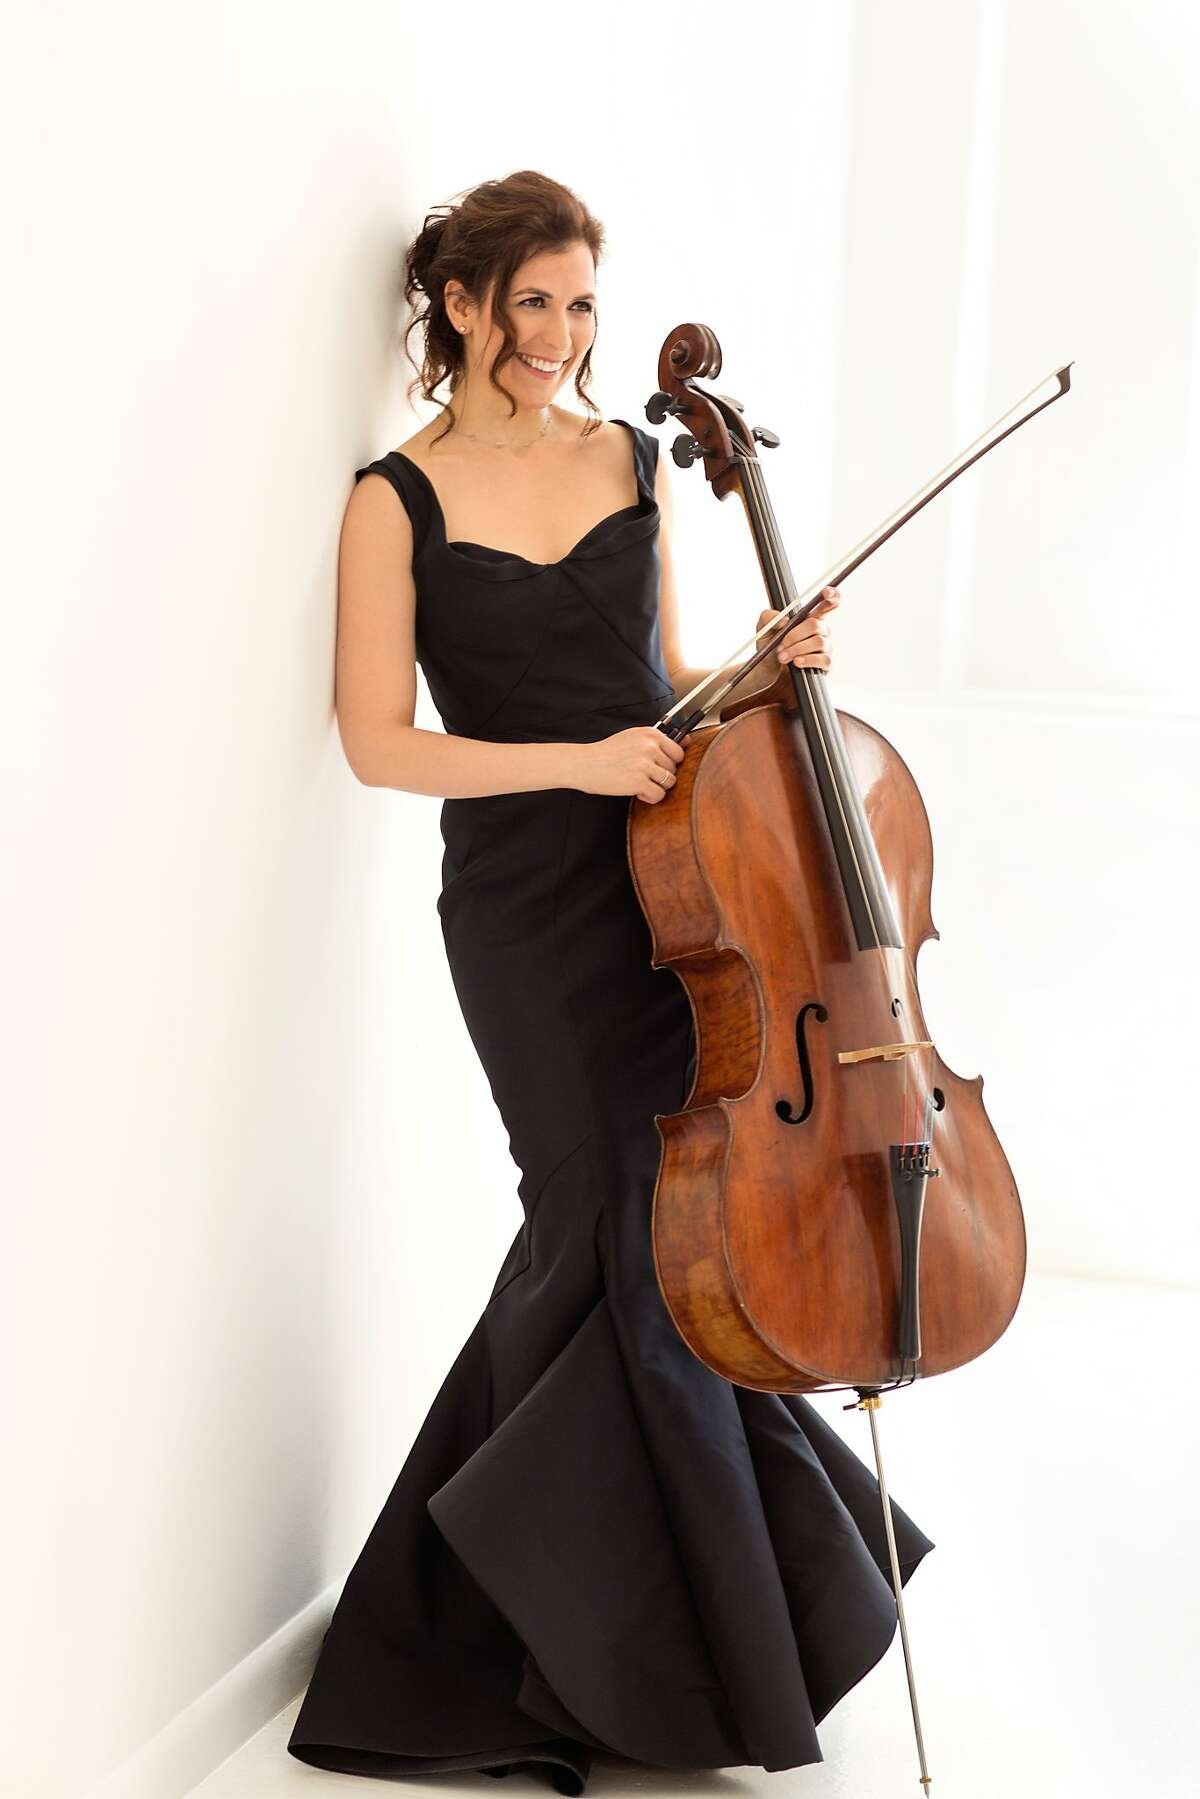 Israeli cellist Inbal Segev will premiere